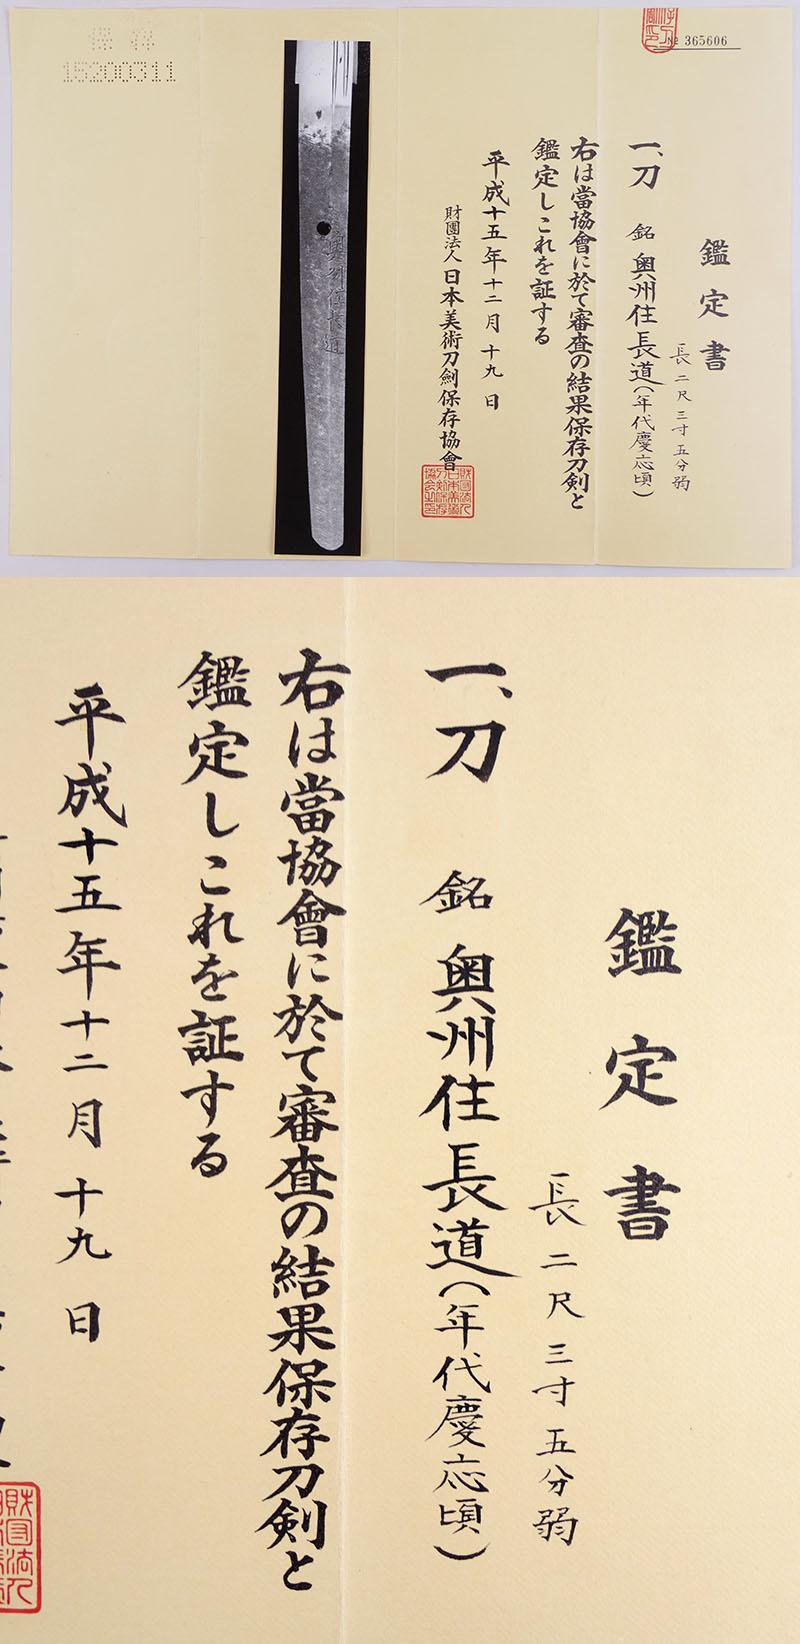 奥州住長道(斗南住長道) Picture of Certificate